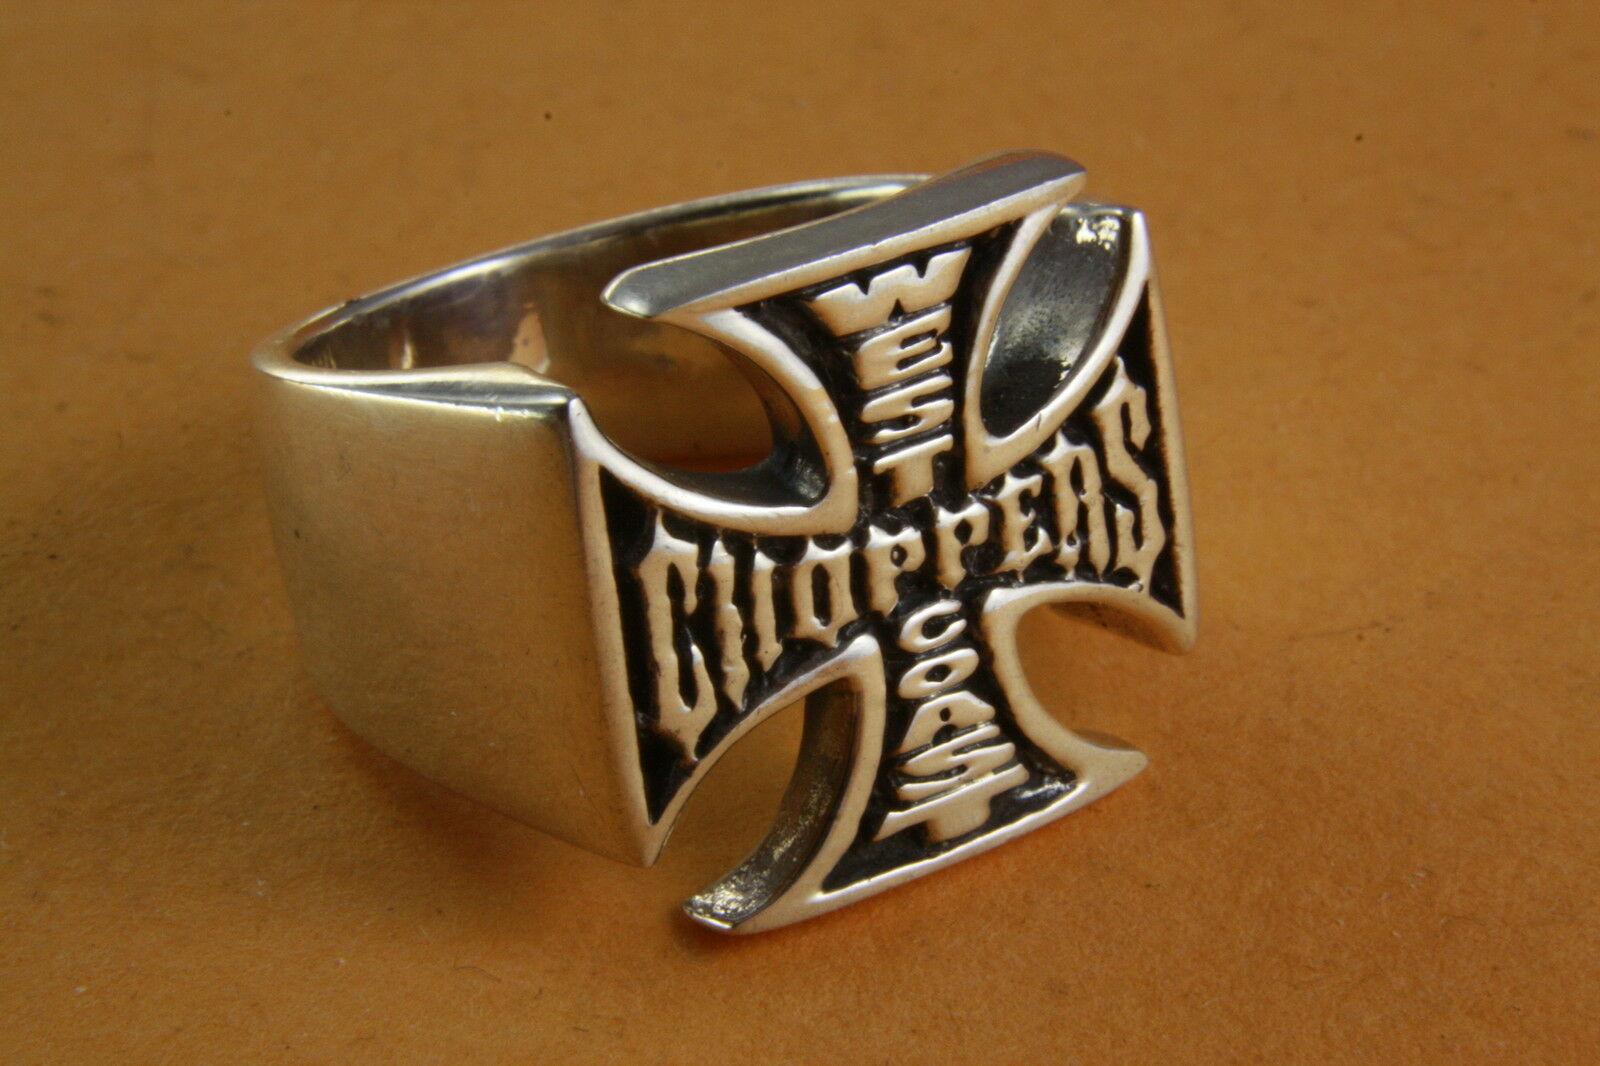 MASSIVER CHOPPER BIKER SIEGELRING HERRENRING 925 silver silverRING   014